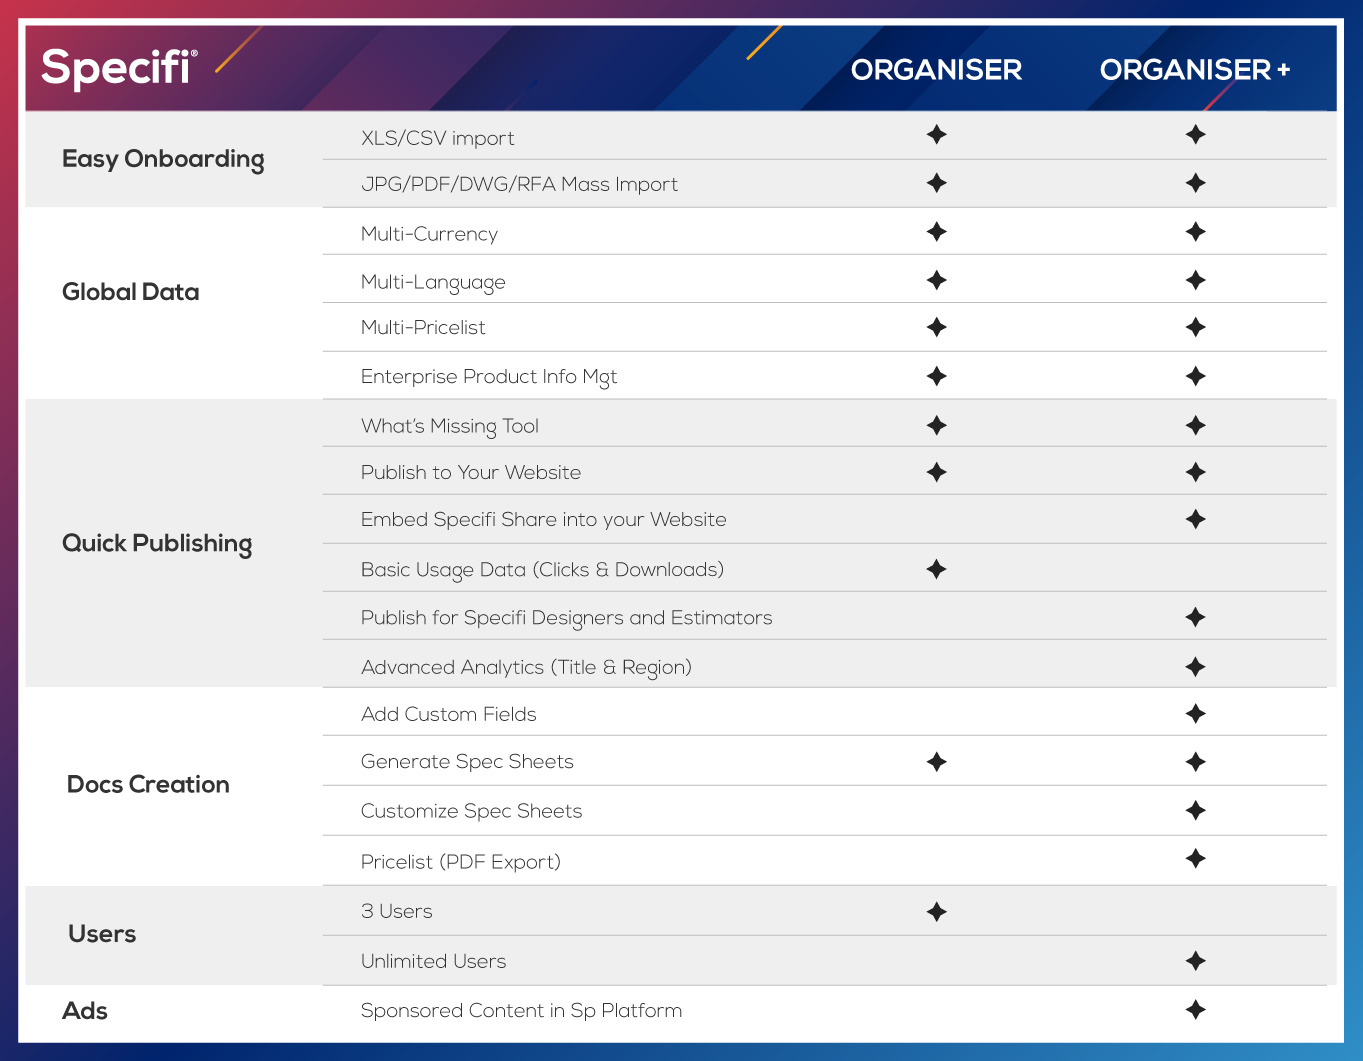 Organiser Comparison Chart v2